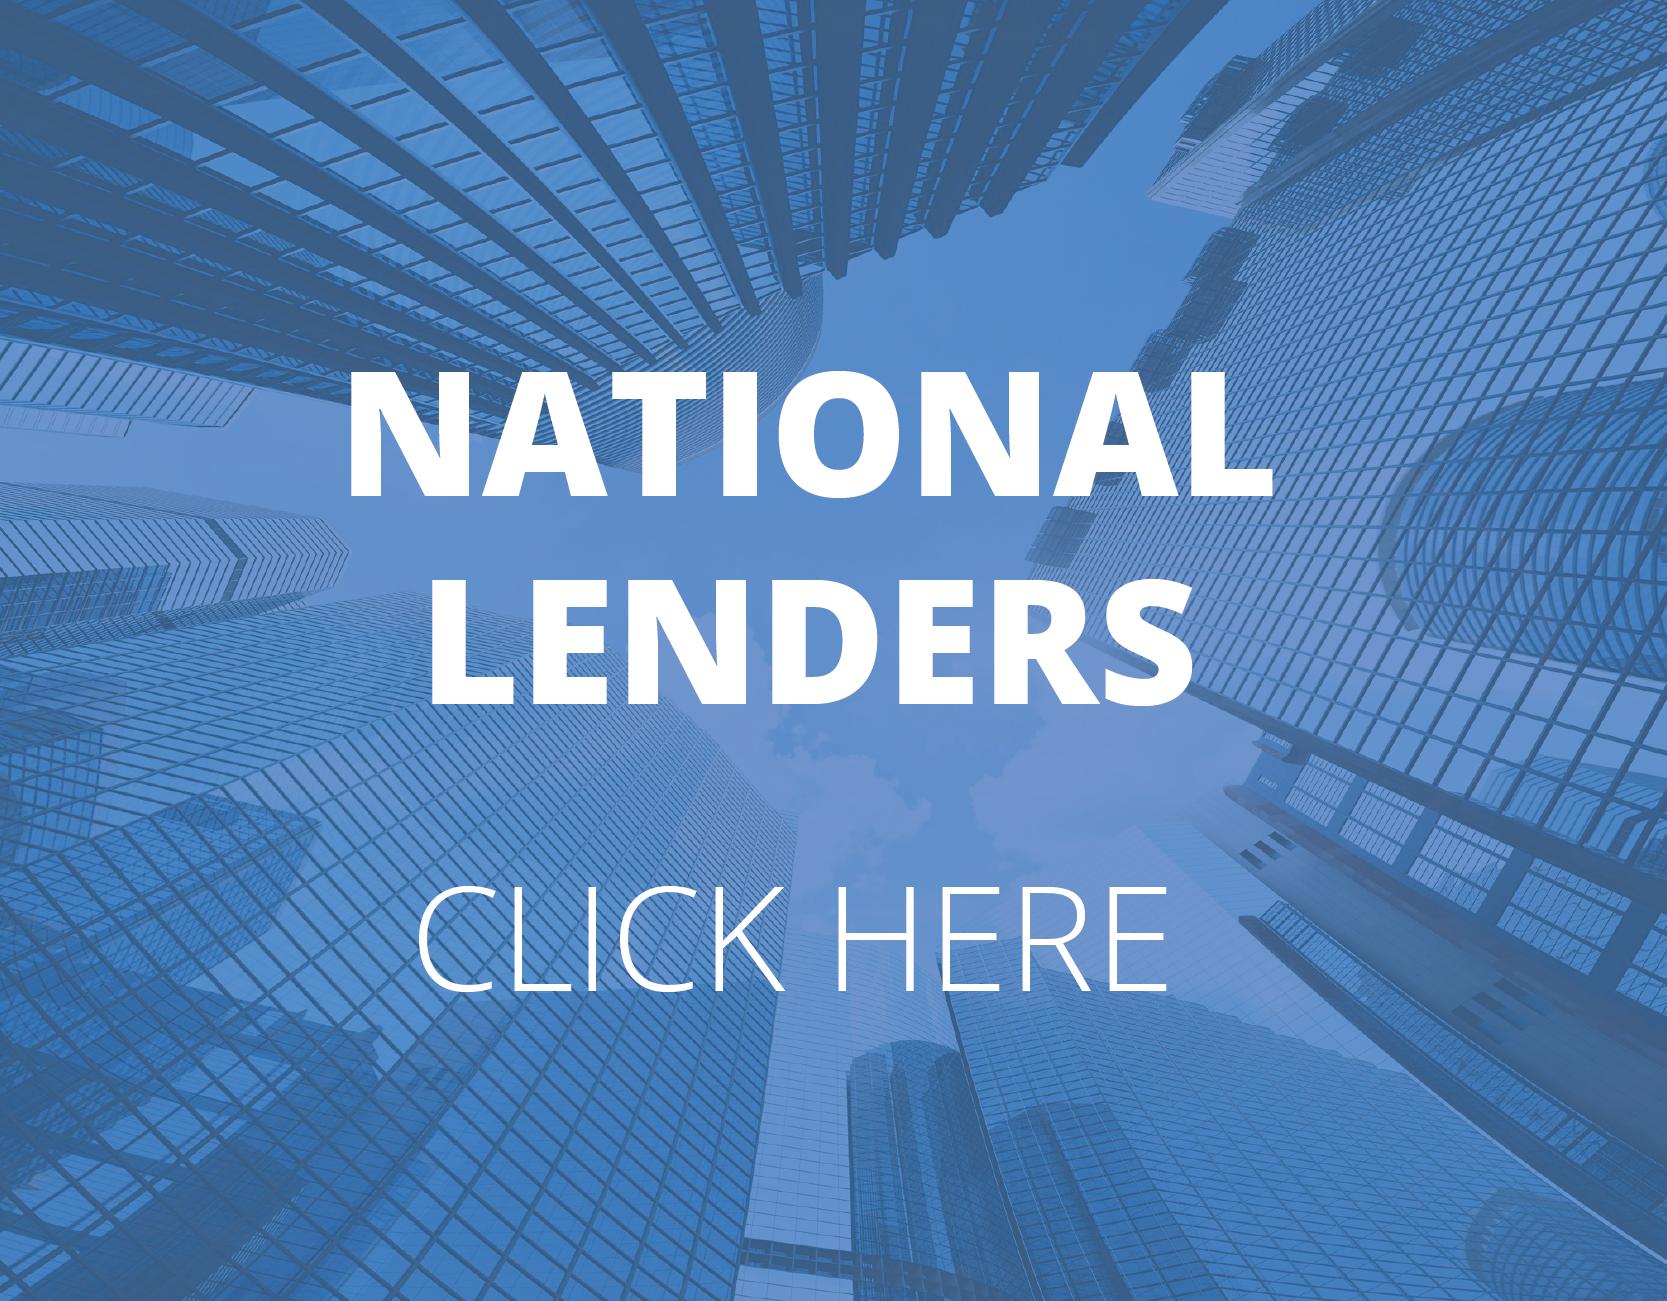 National Lenders